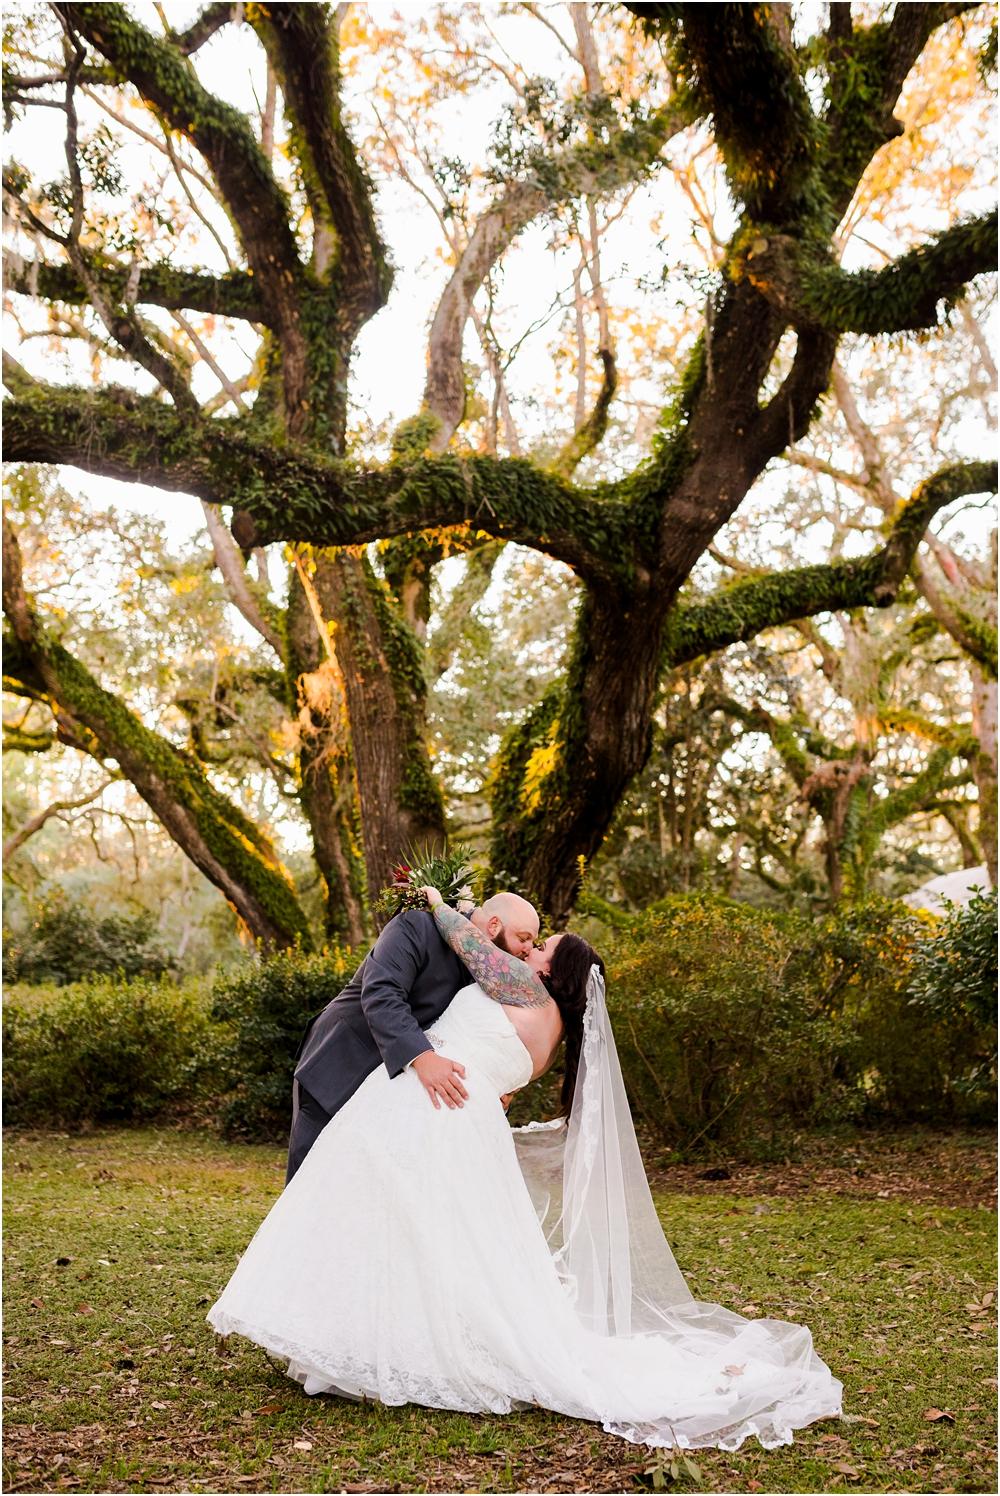 Eden-Gardens-florida-wedding-photographer-kiersten-stevenson-photography-107.jpg